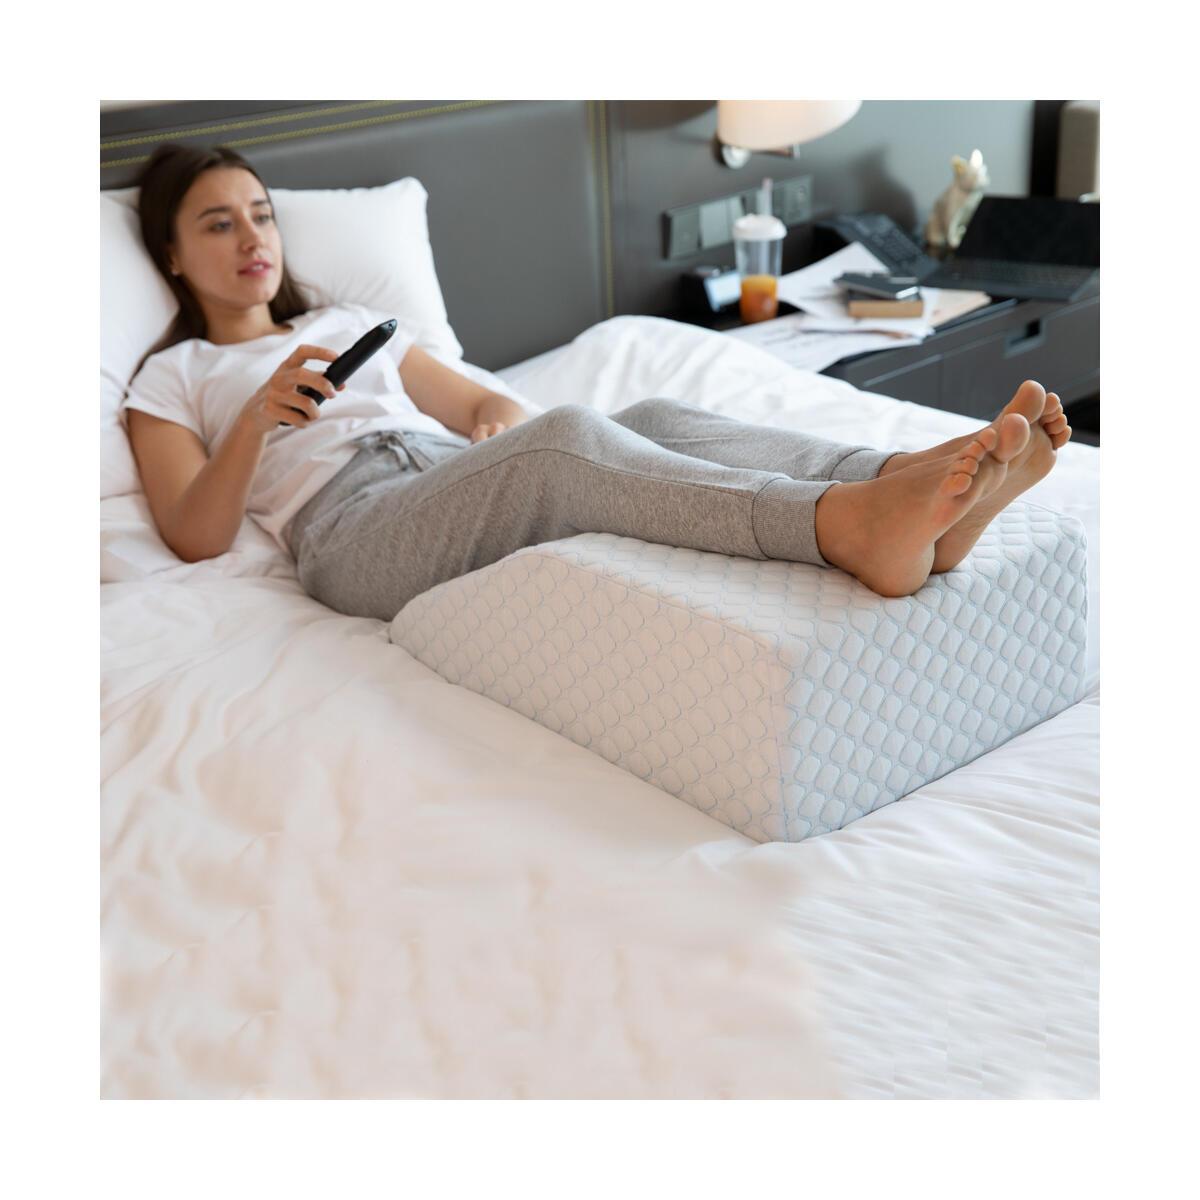 elevating leg rest pillow